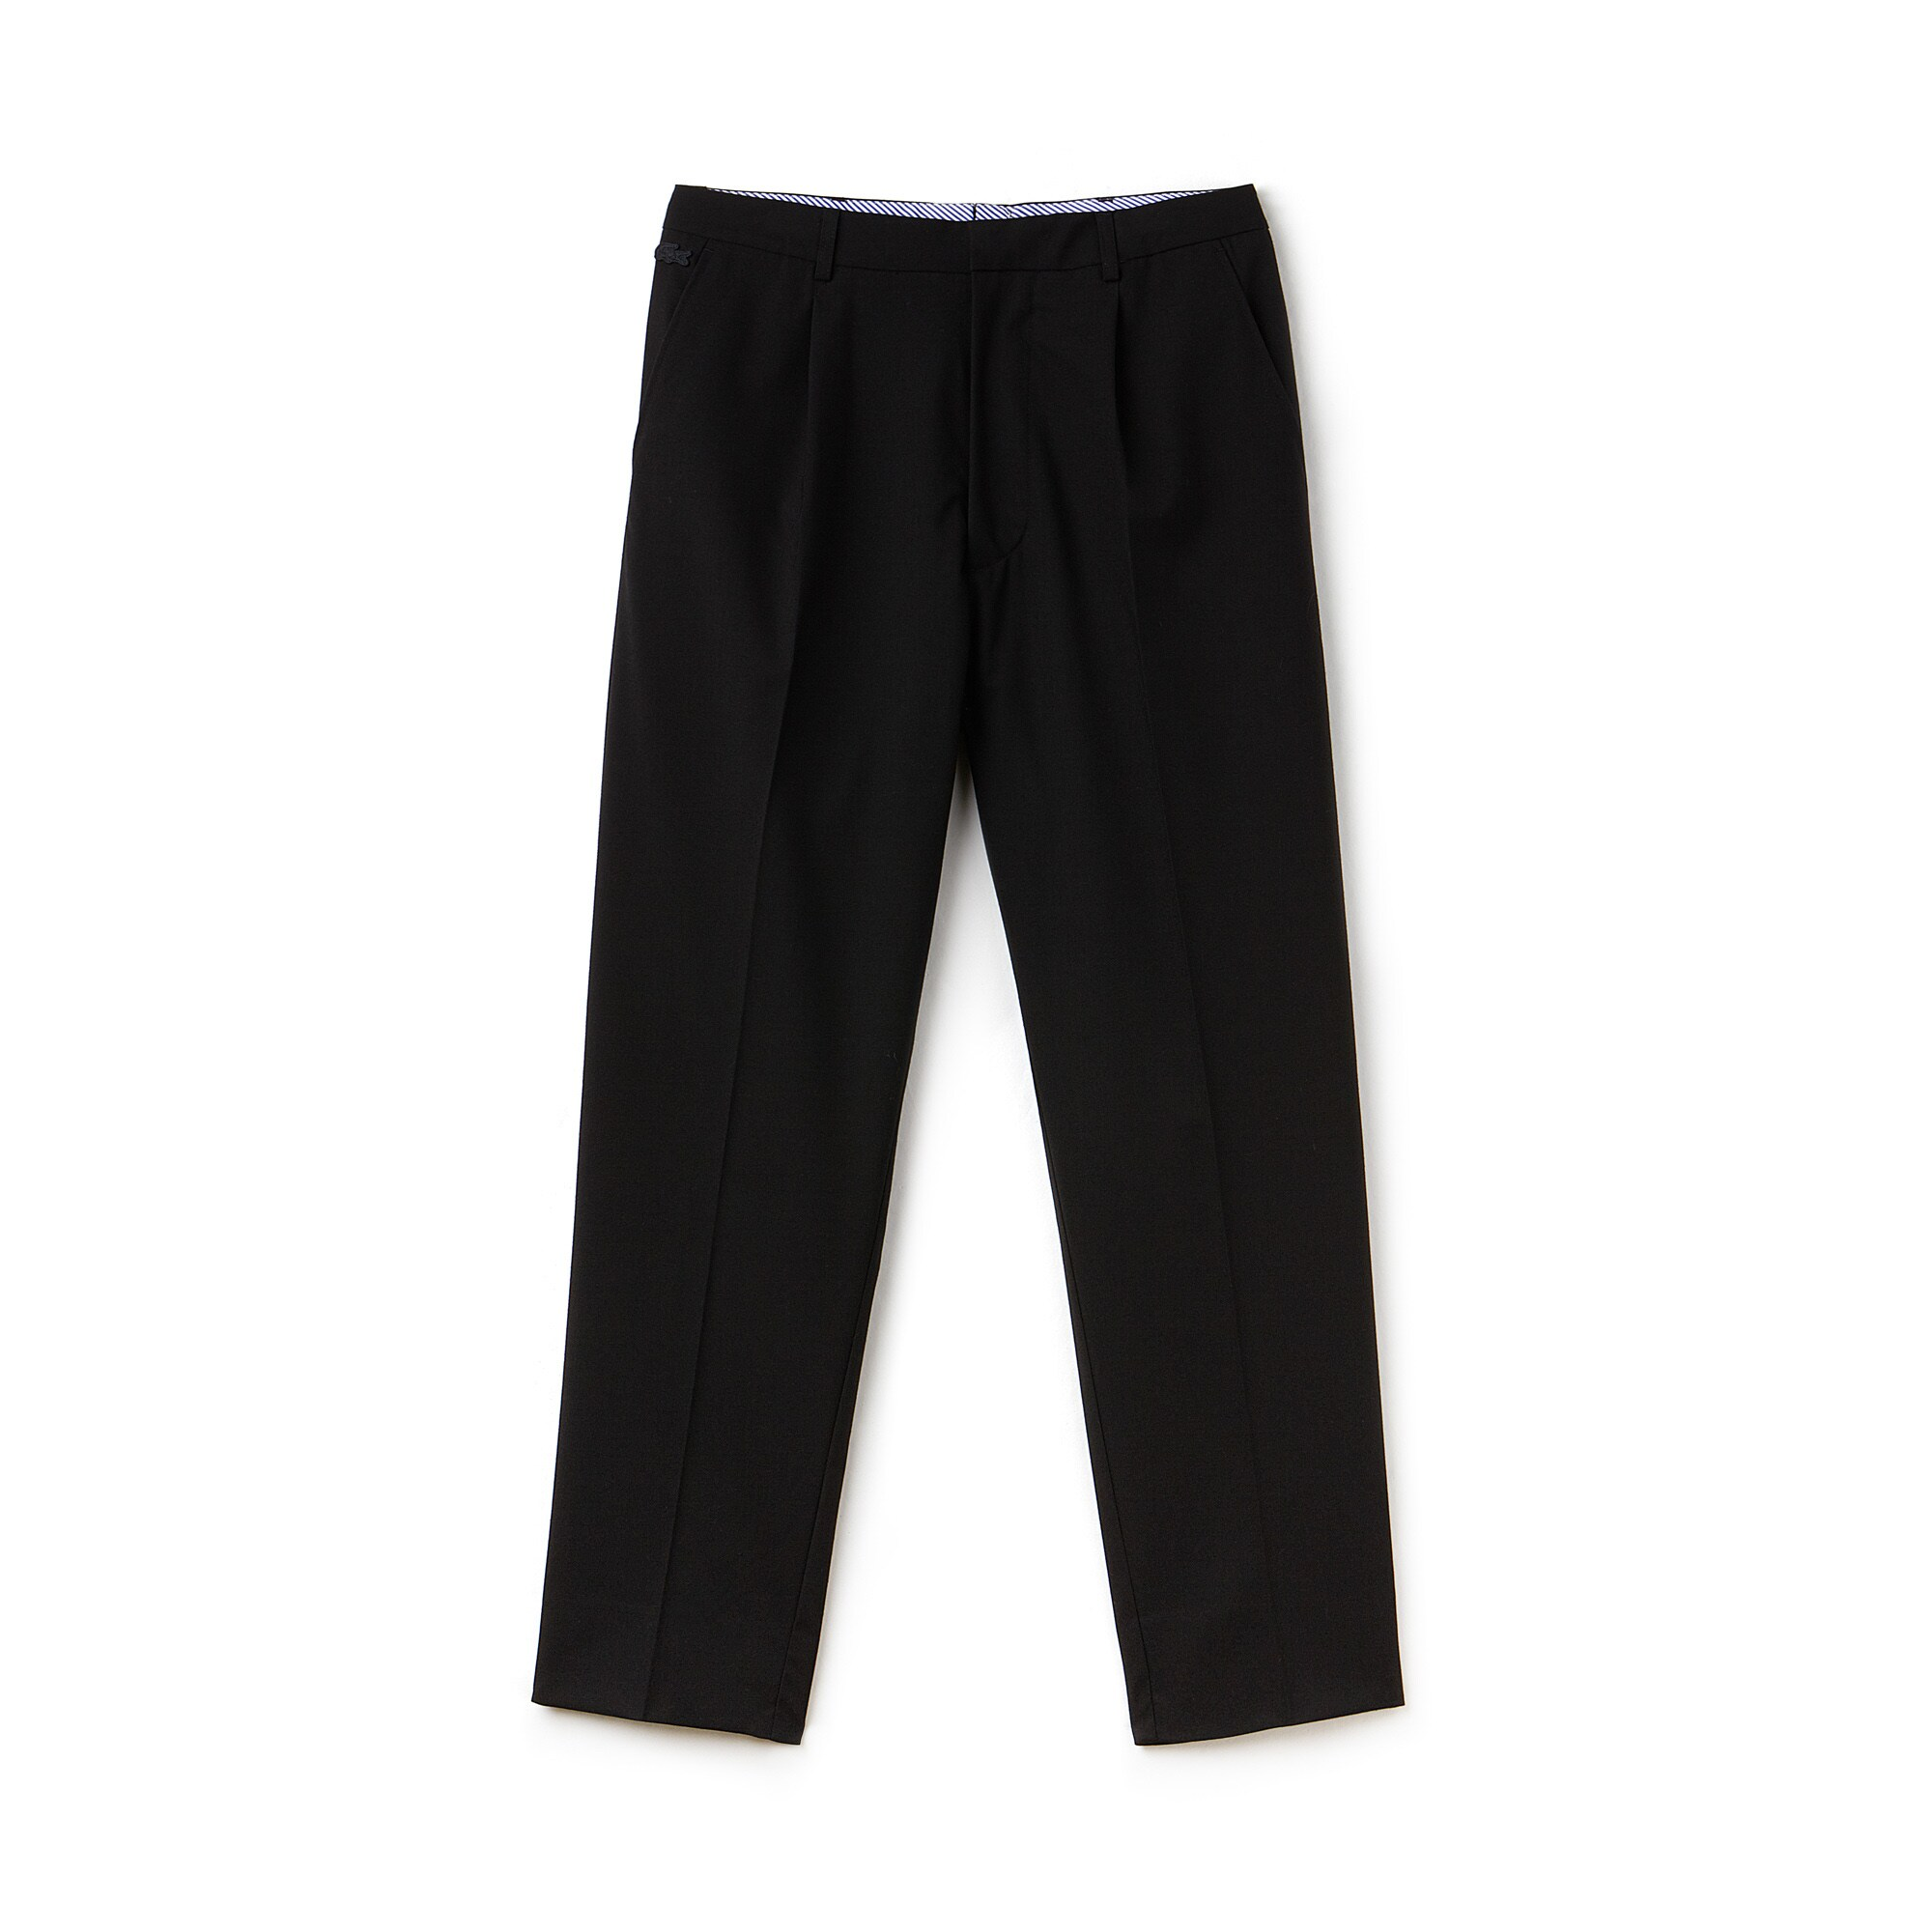 Pantaloni chino con pince Lacoste LIVE in crêpe stretch tinta unita